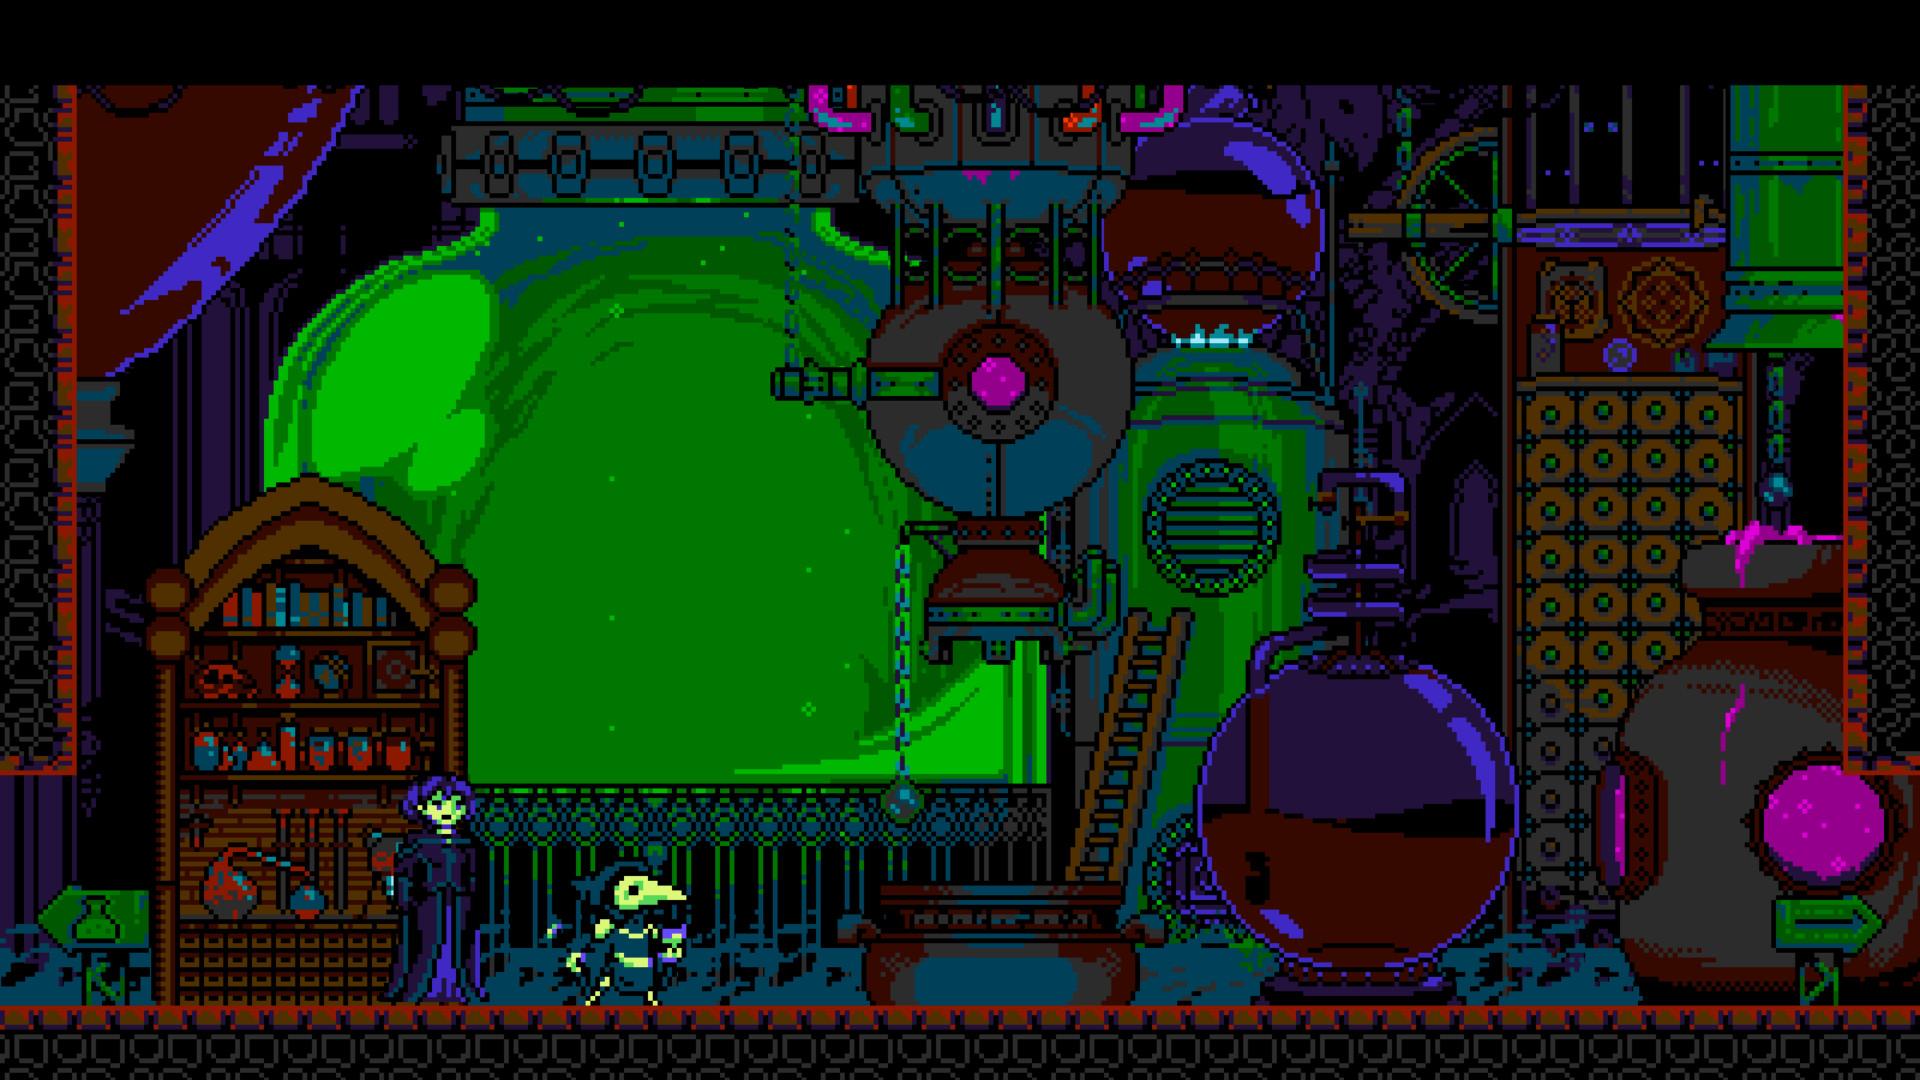 General Shovel Knight video games pixel art 8-bit 16-bit fantasy  art